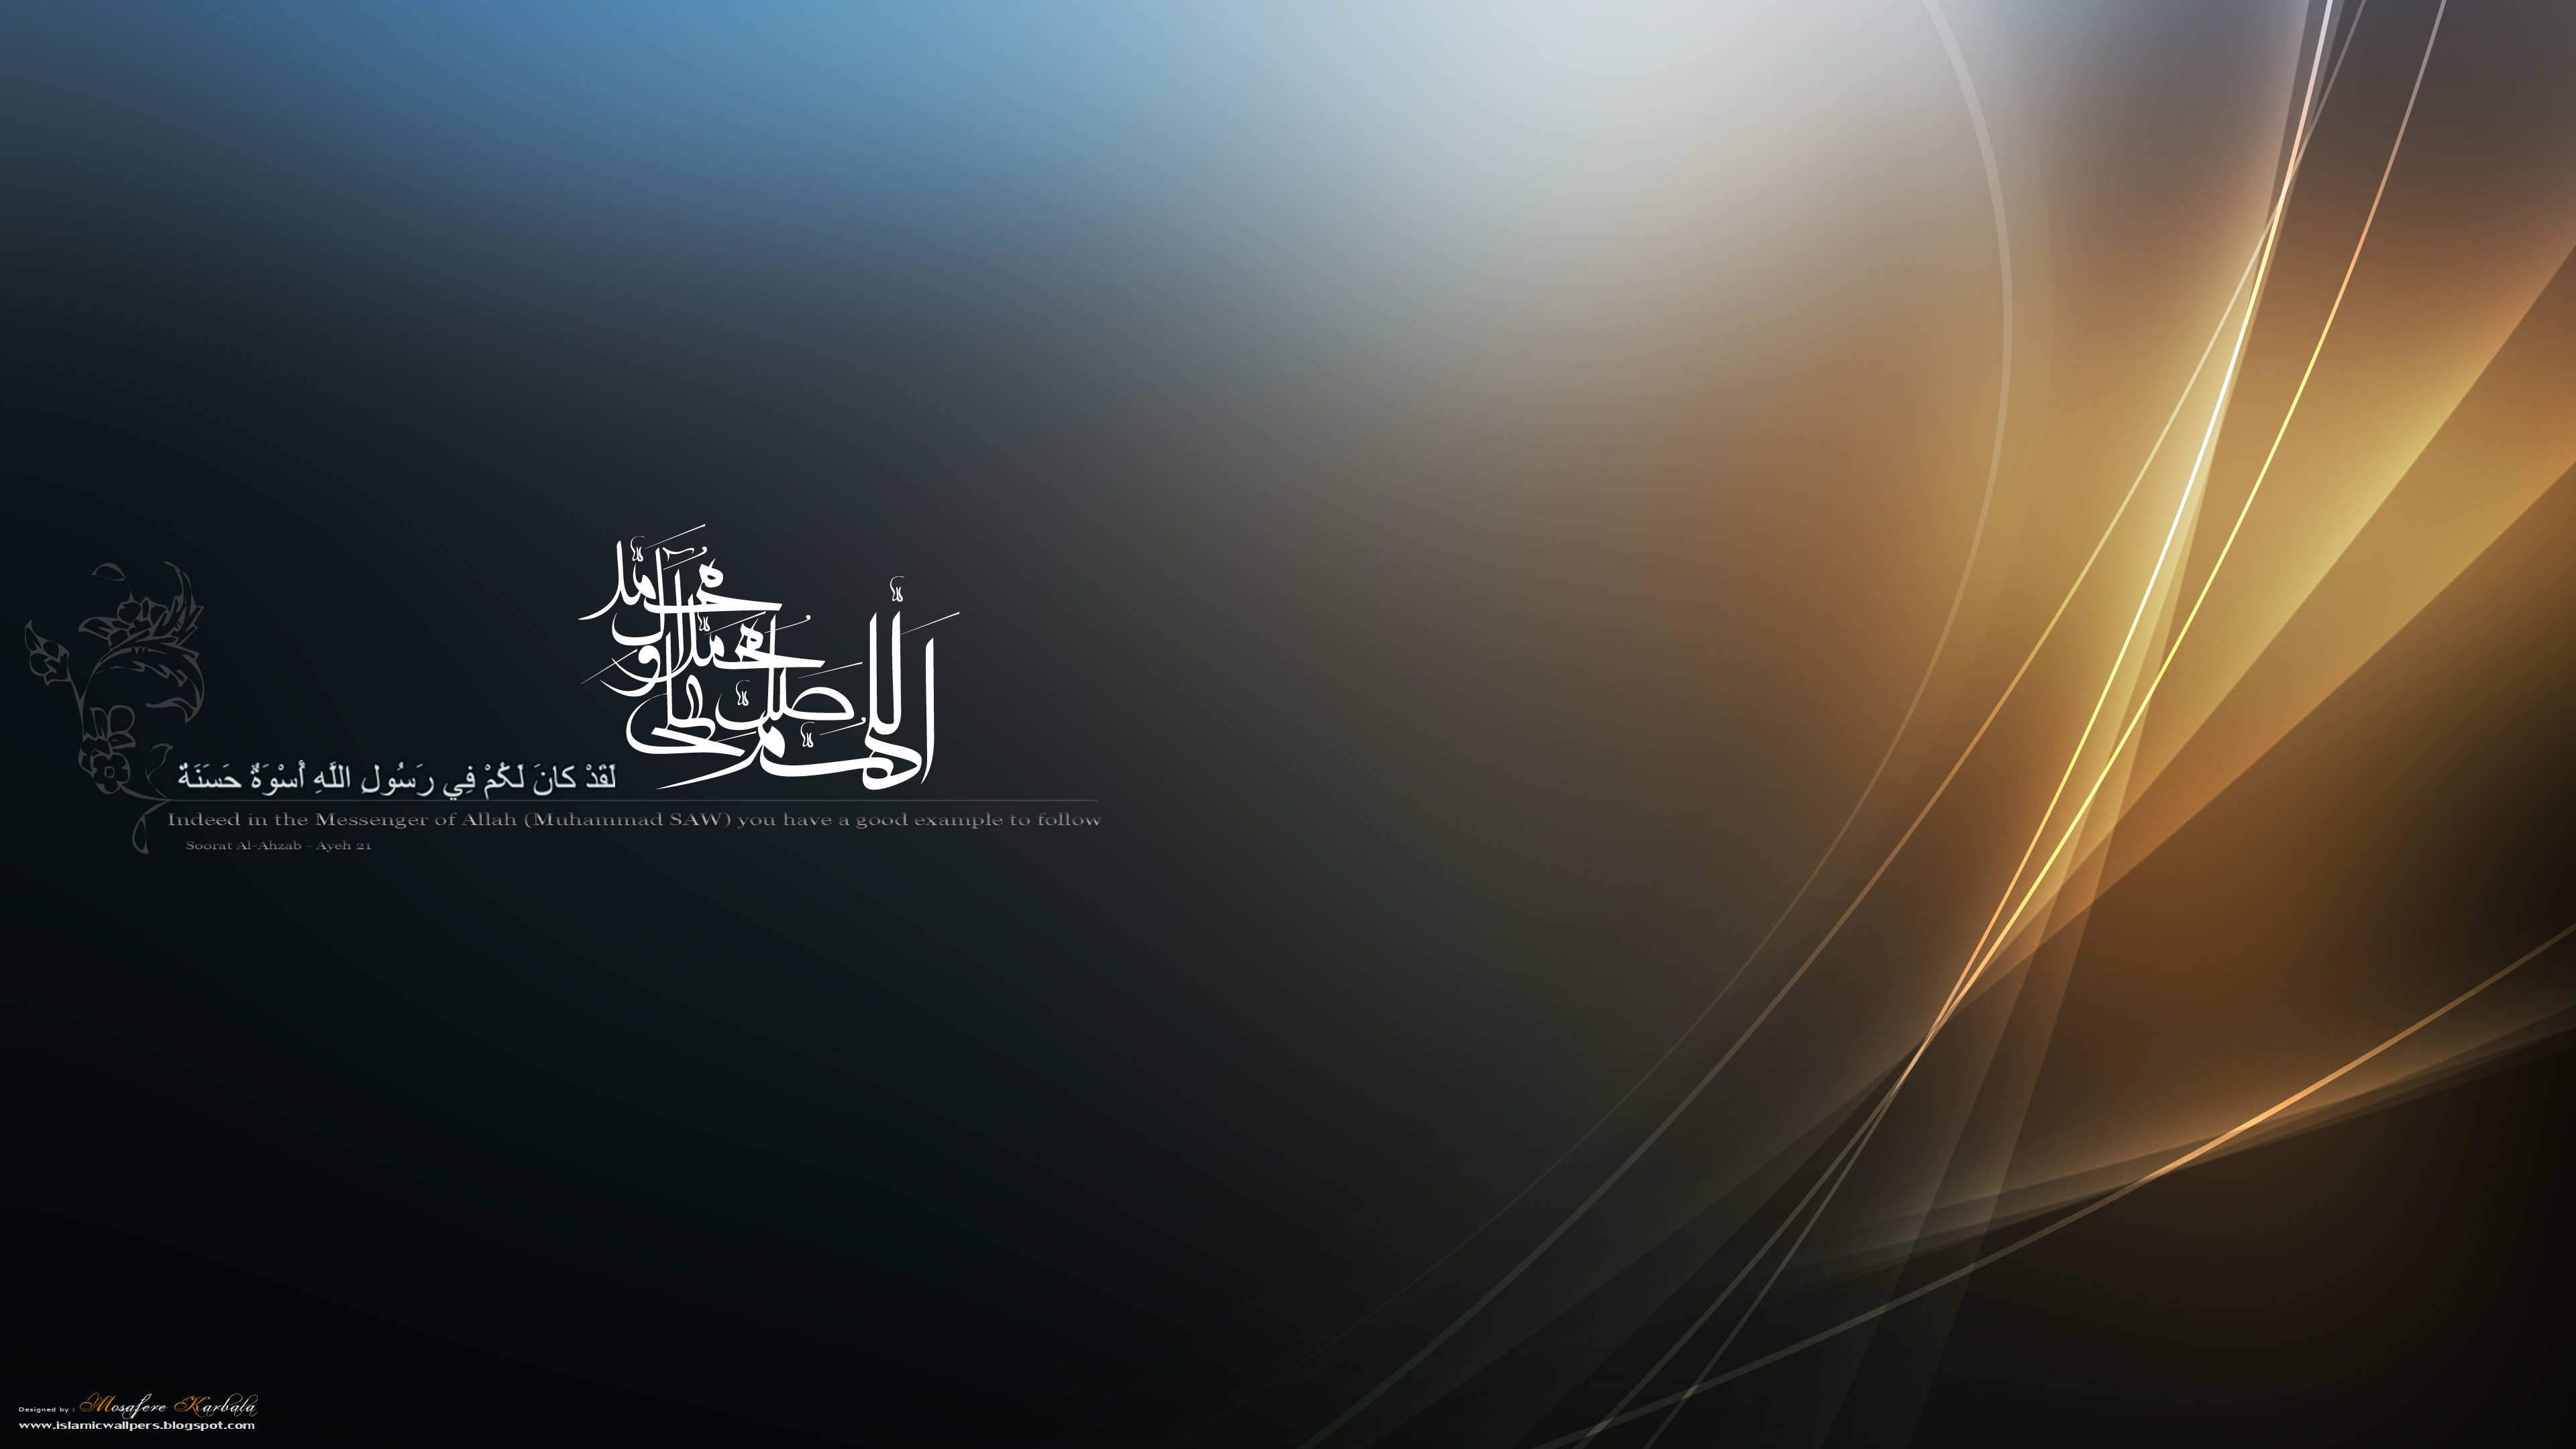 http://www.hdwallpaper.nu/wp-content/uploads/2015/02/islamic_wallpaper_16.jpg